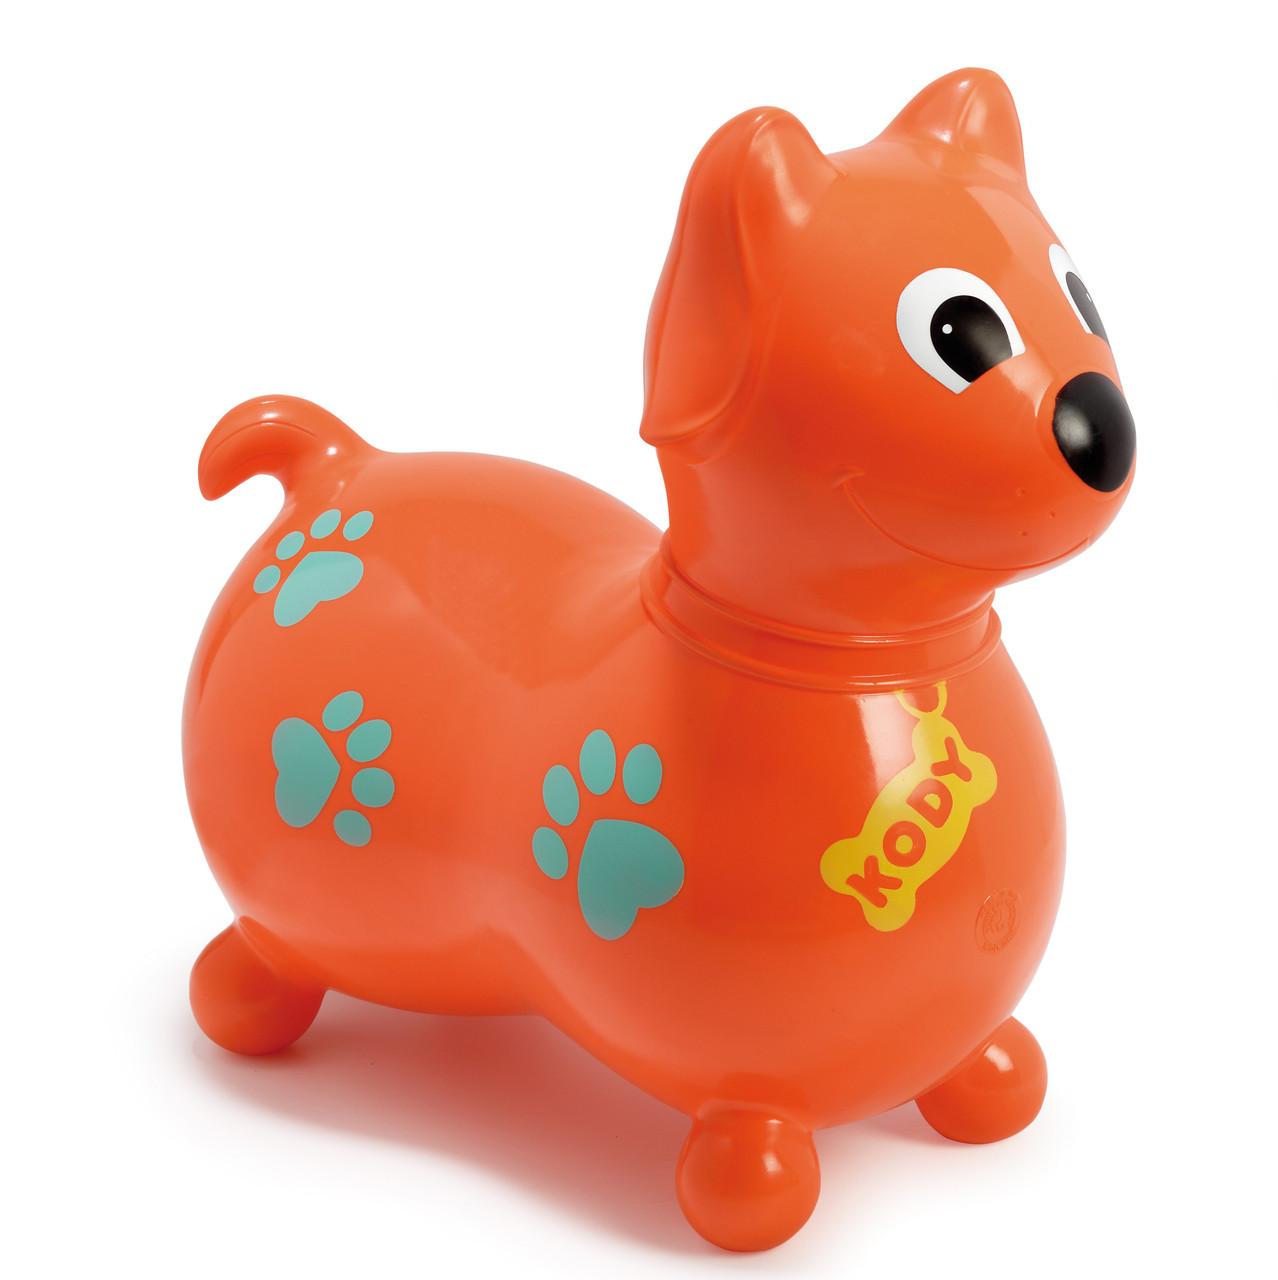 kody orange 1 x aufblasbarer h pfhund f r kinder ab 3. Black Bedroom Furniture Sets. Home Design Ideas